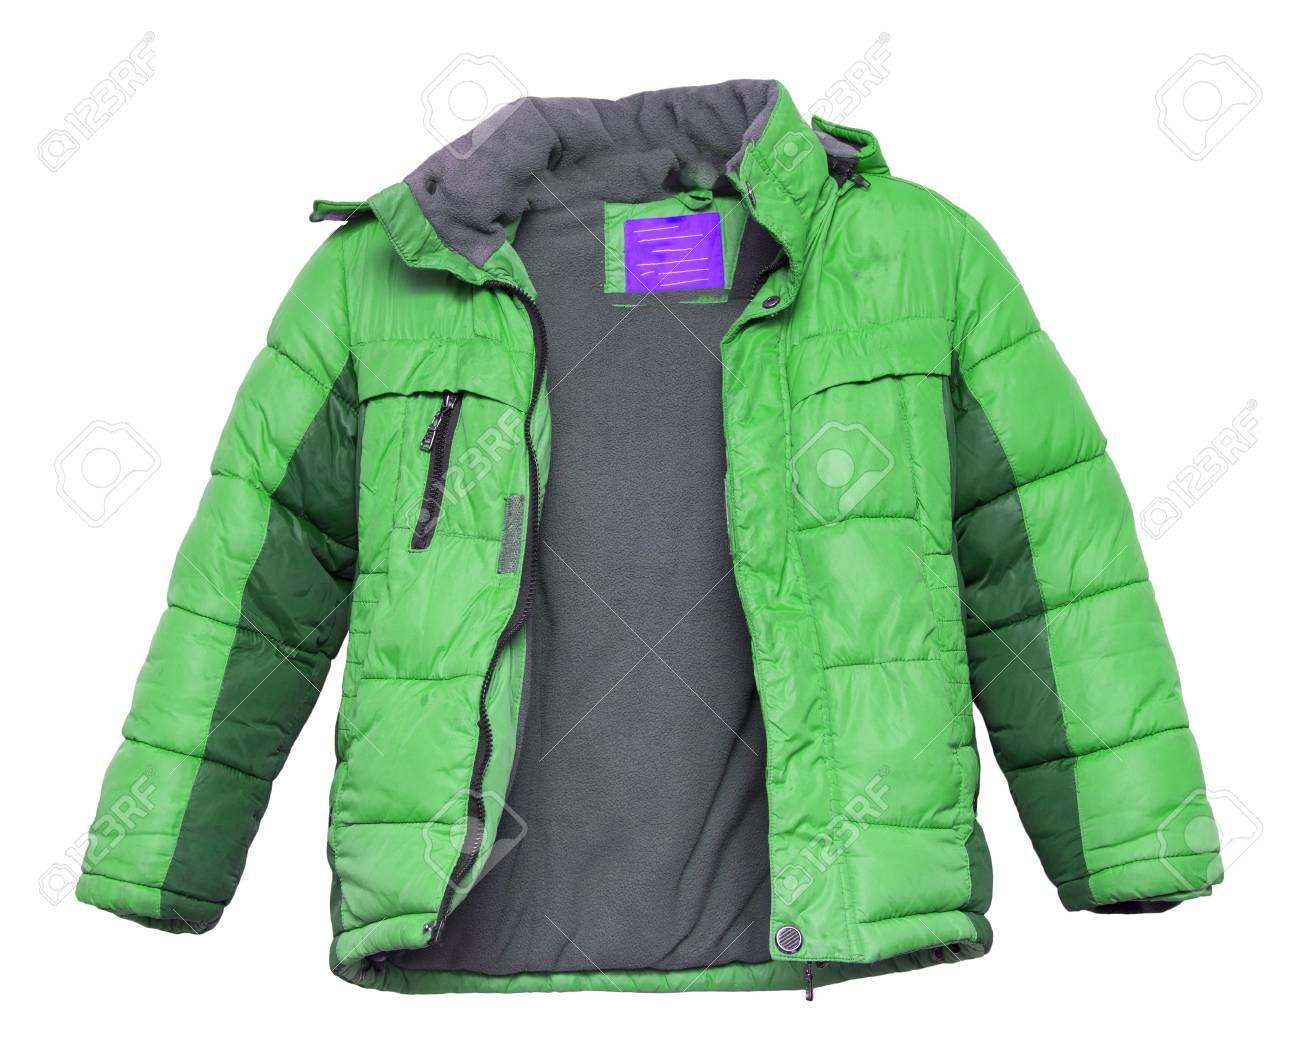 b22f9c0c7 Children s Winter Jacket Isolated On White Background Stock Photo ...